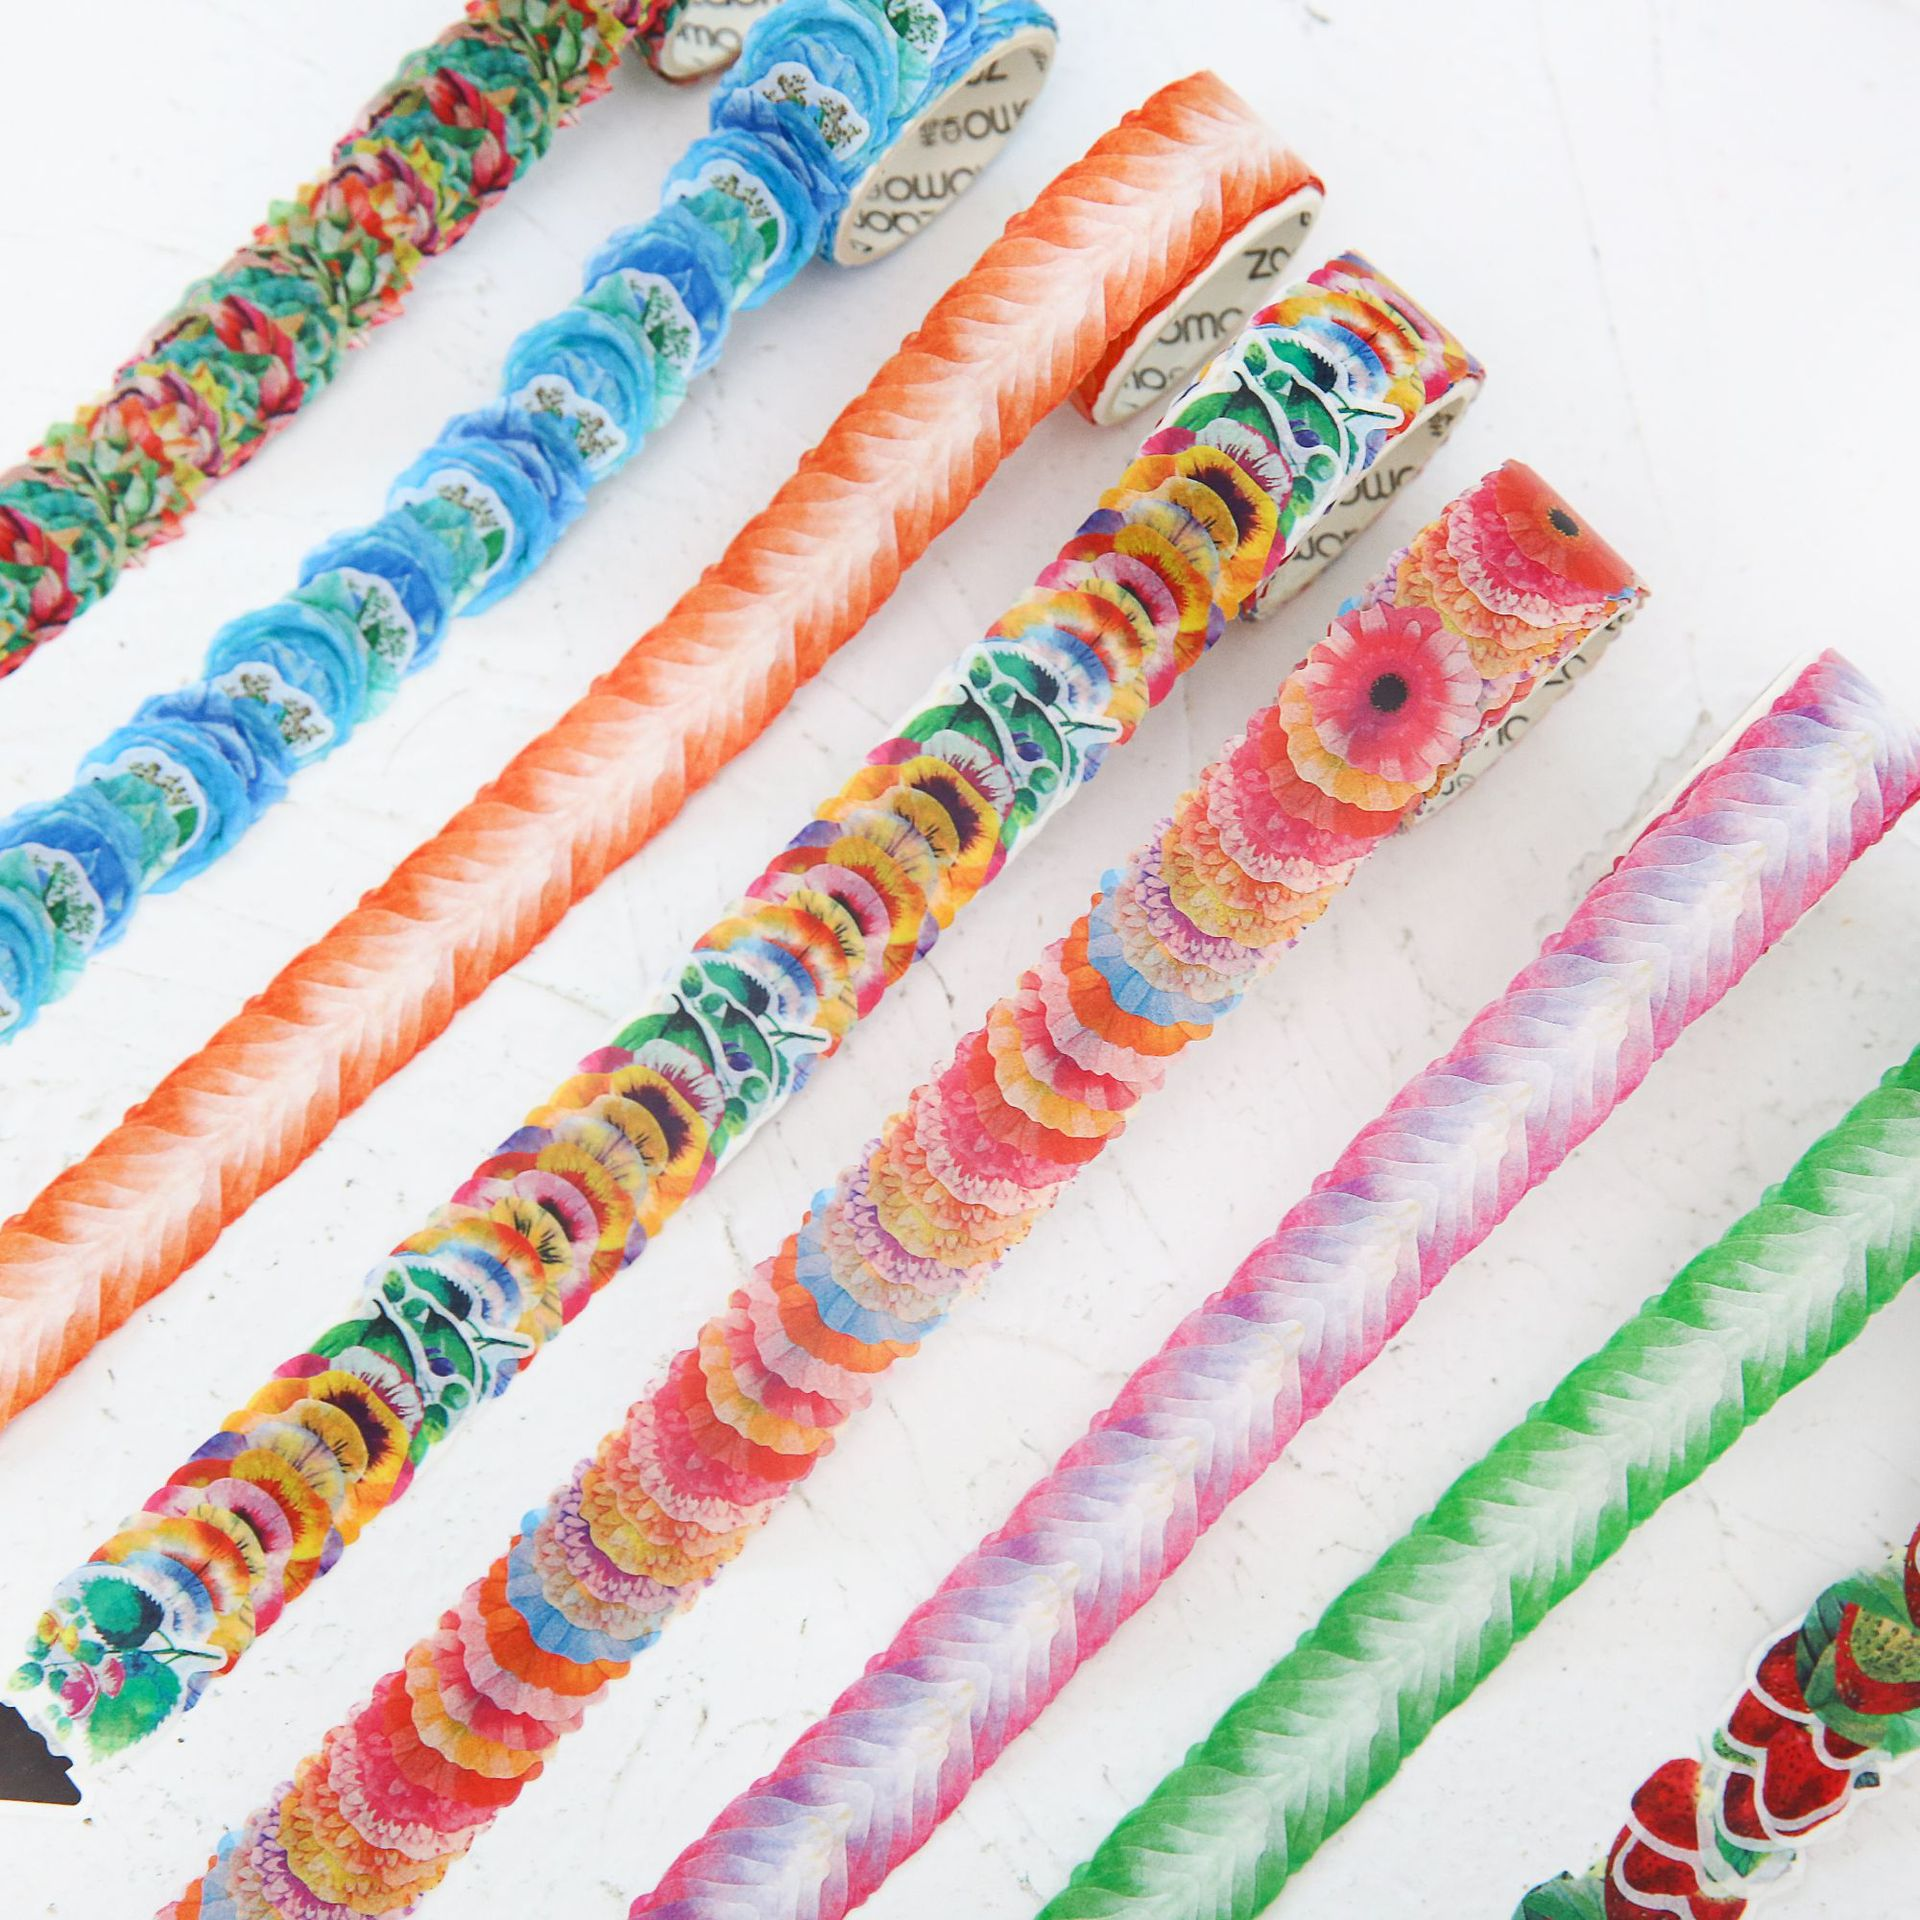 Beautiful Colorful Petals Flowers Decorative Adhesive Tape Masking Washi Tape DIY Scrapbooking Sticker Label Japanese Stationery